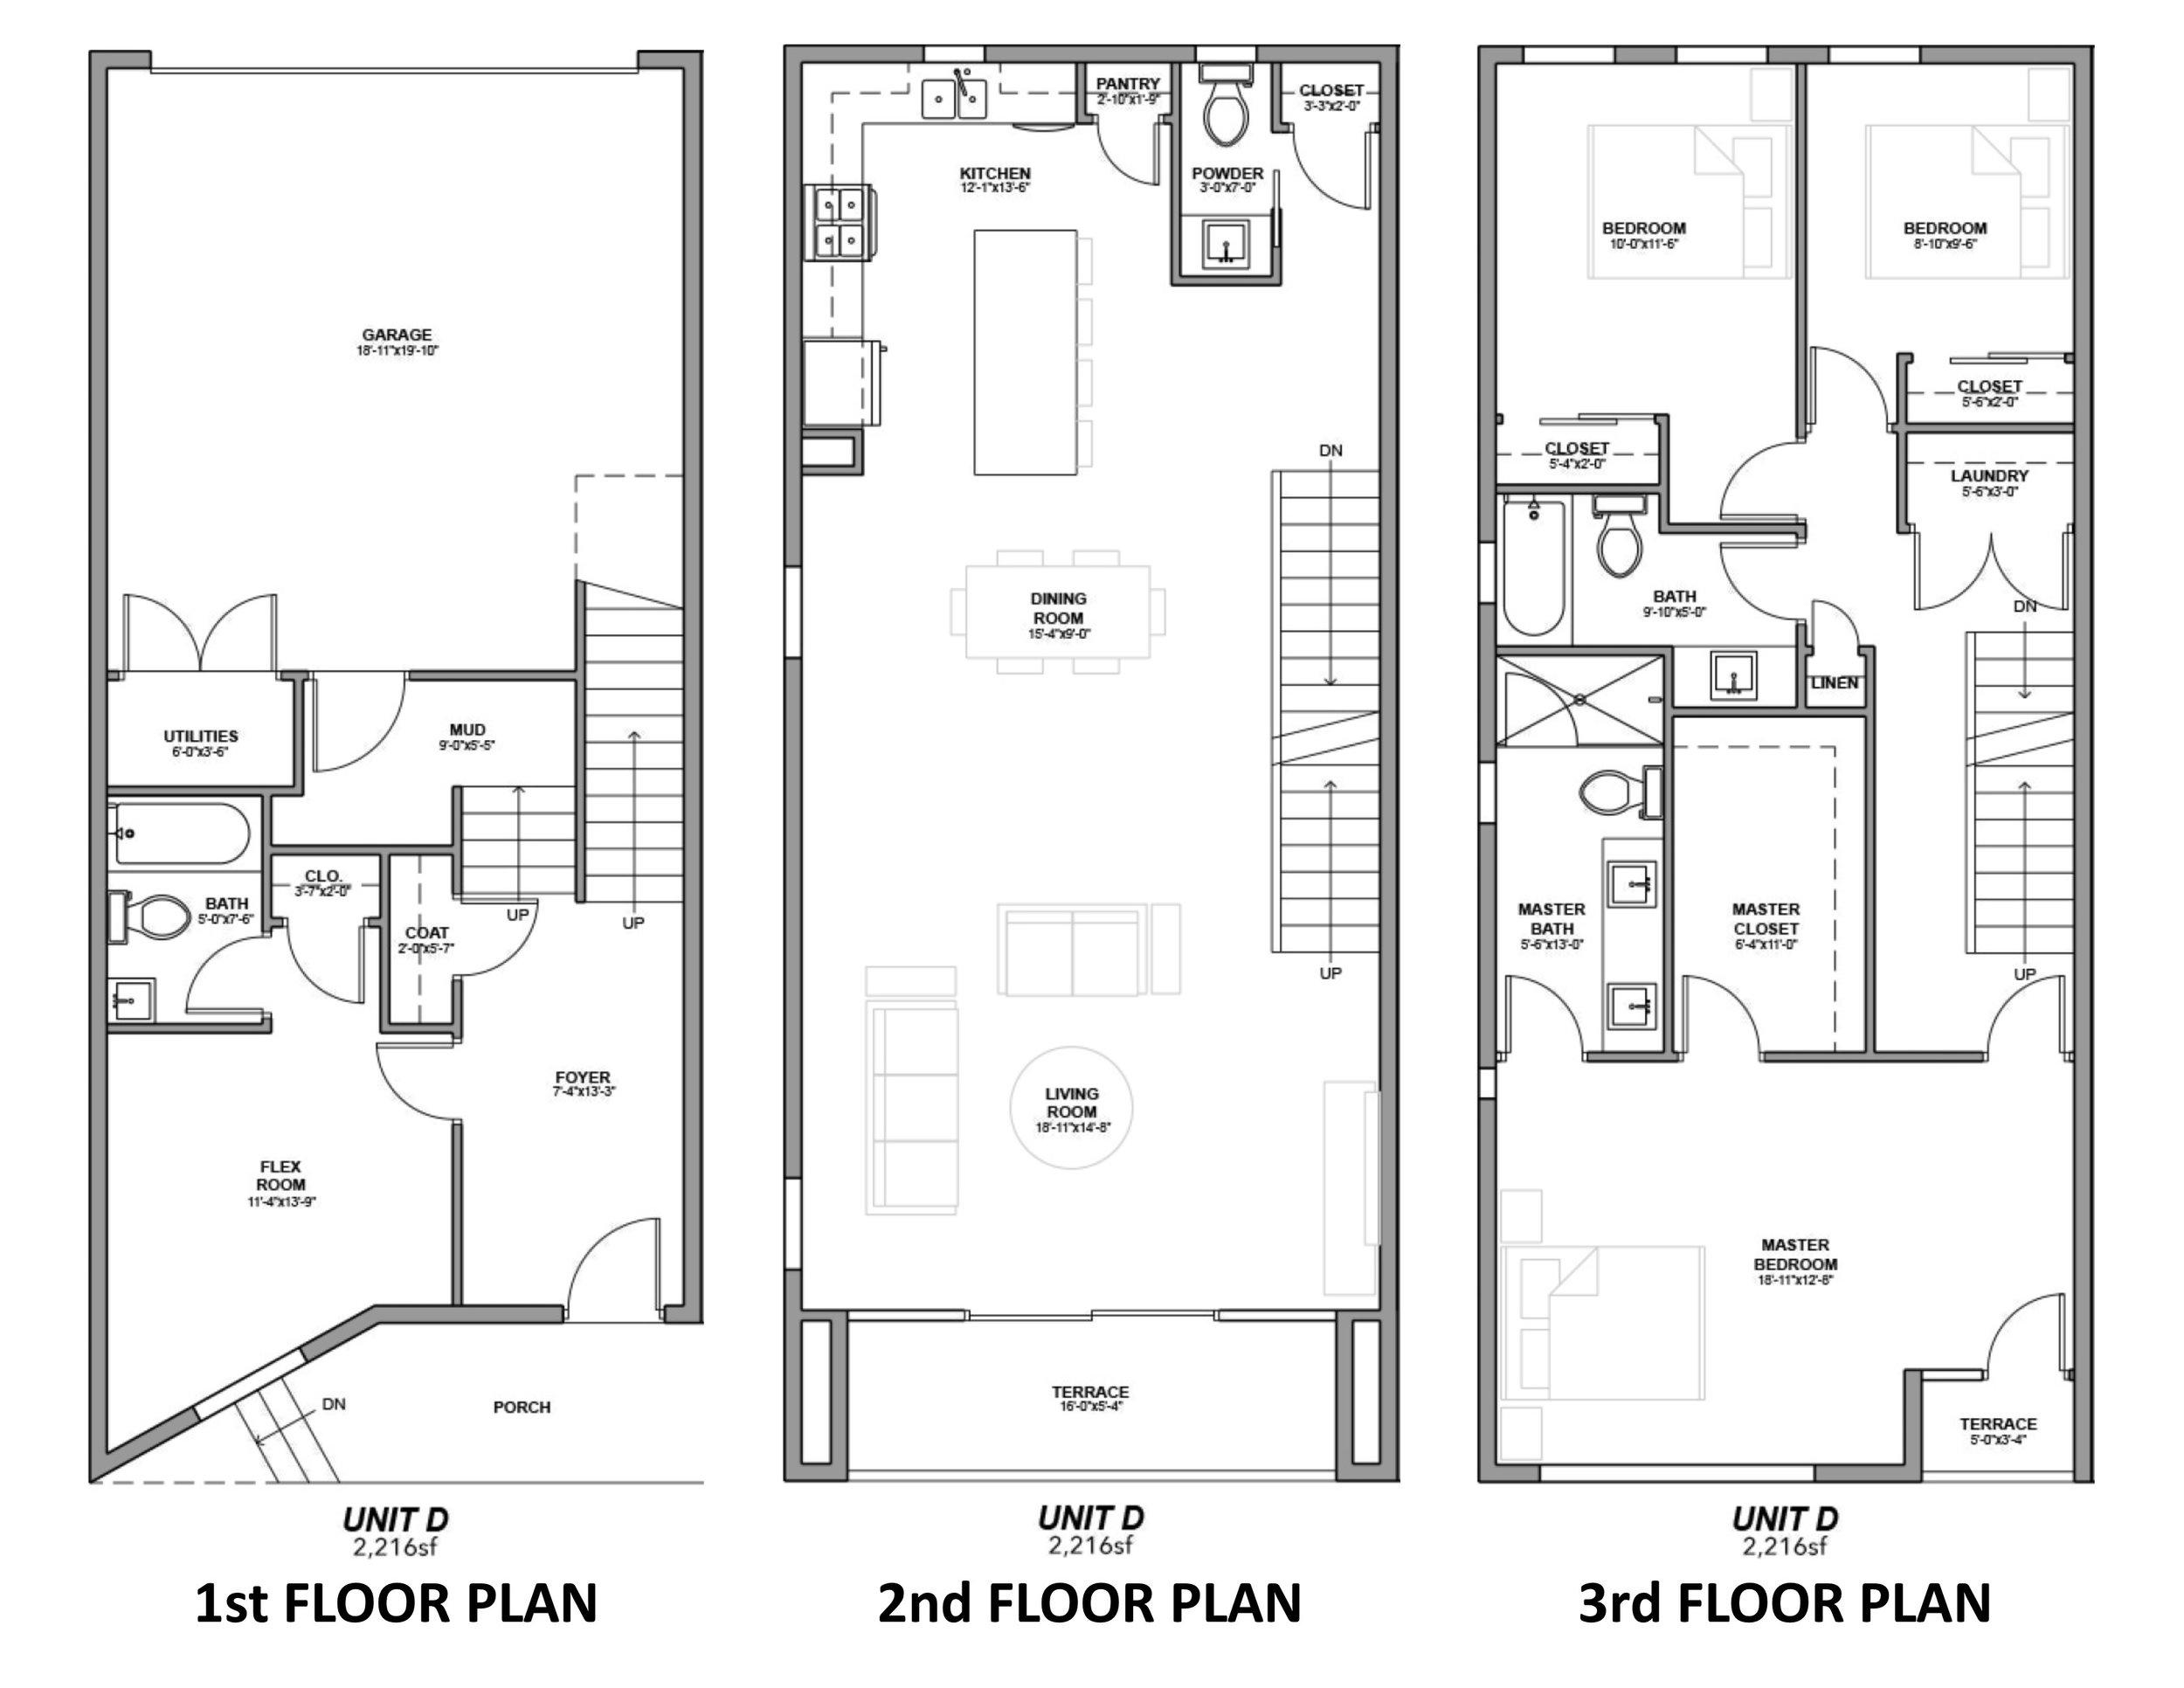 Floorplan Building 3 Unit D 406 Jefferson.jpg